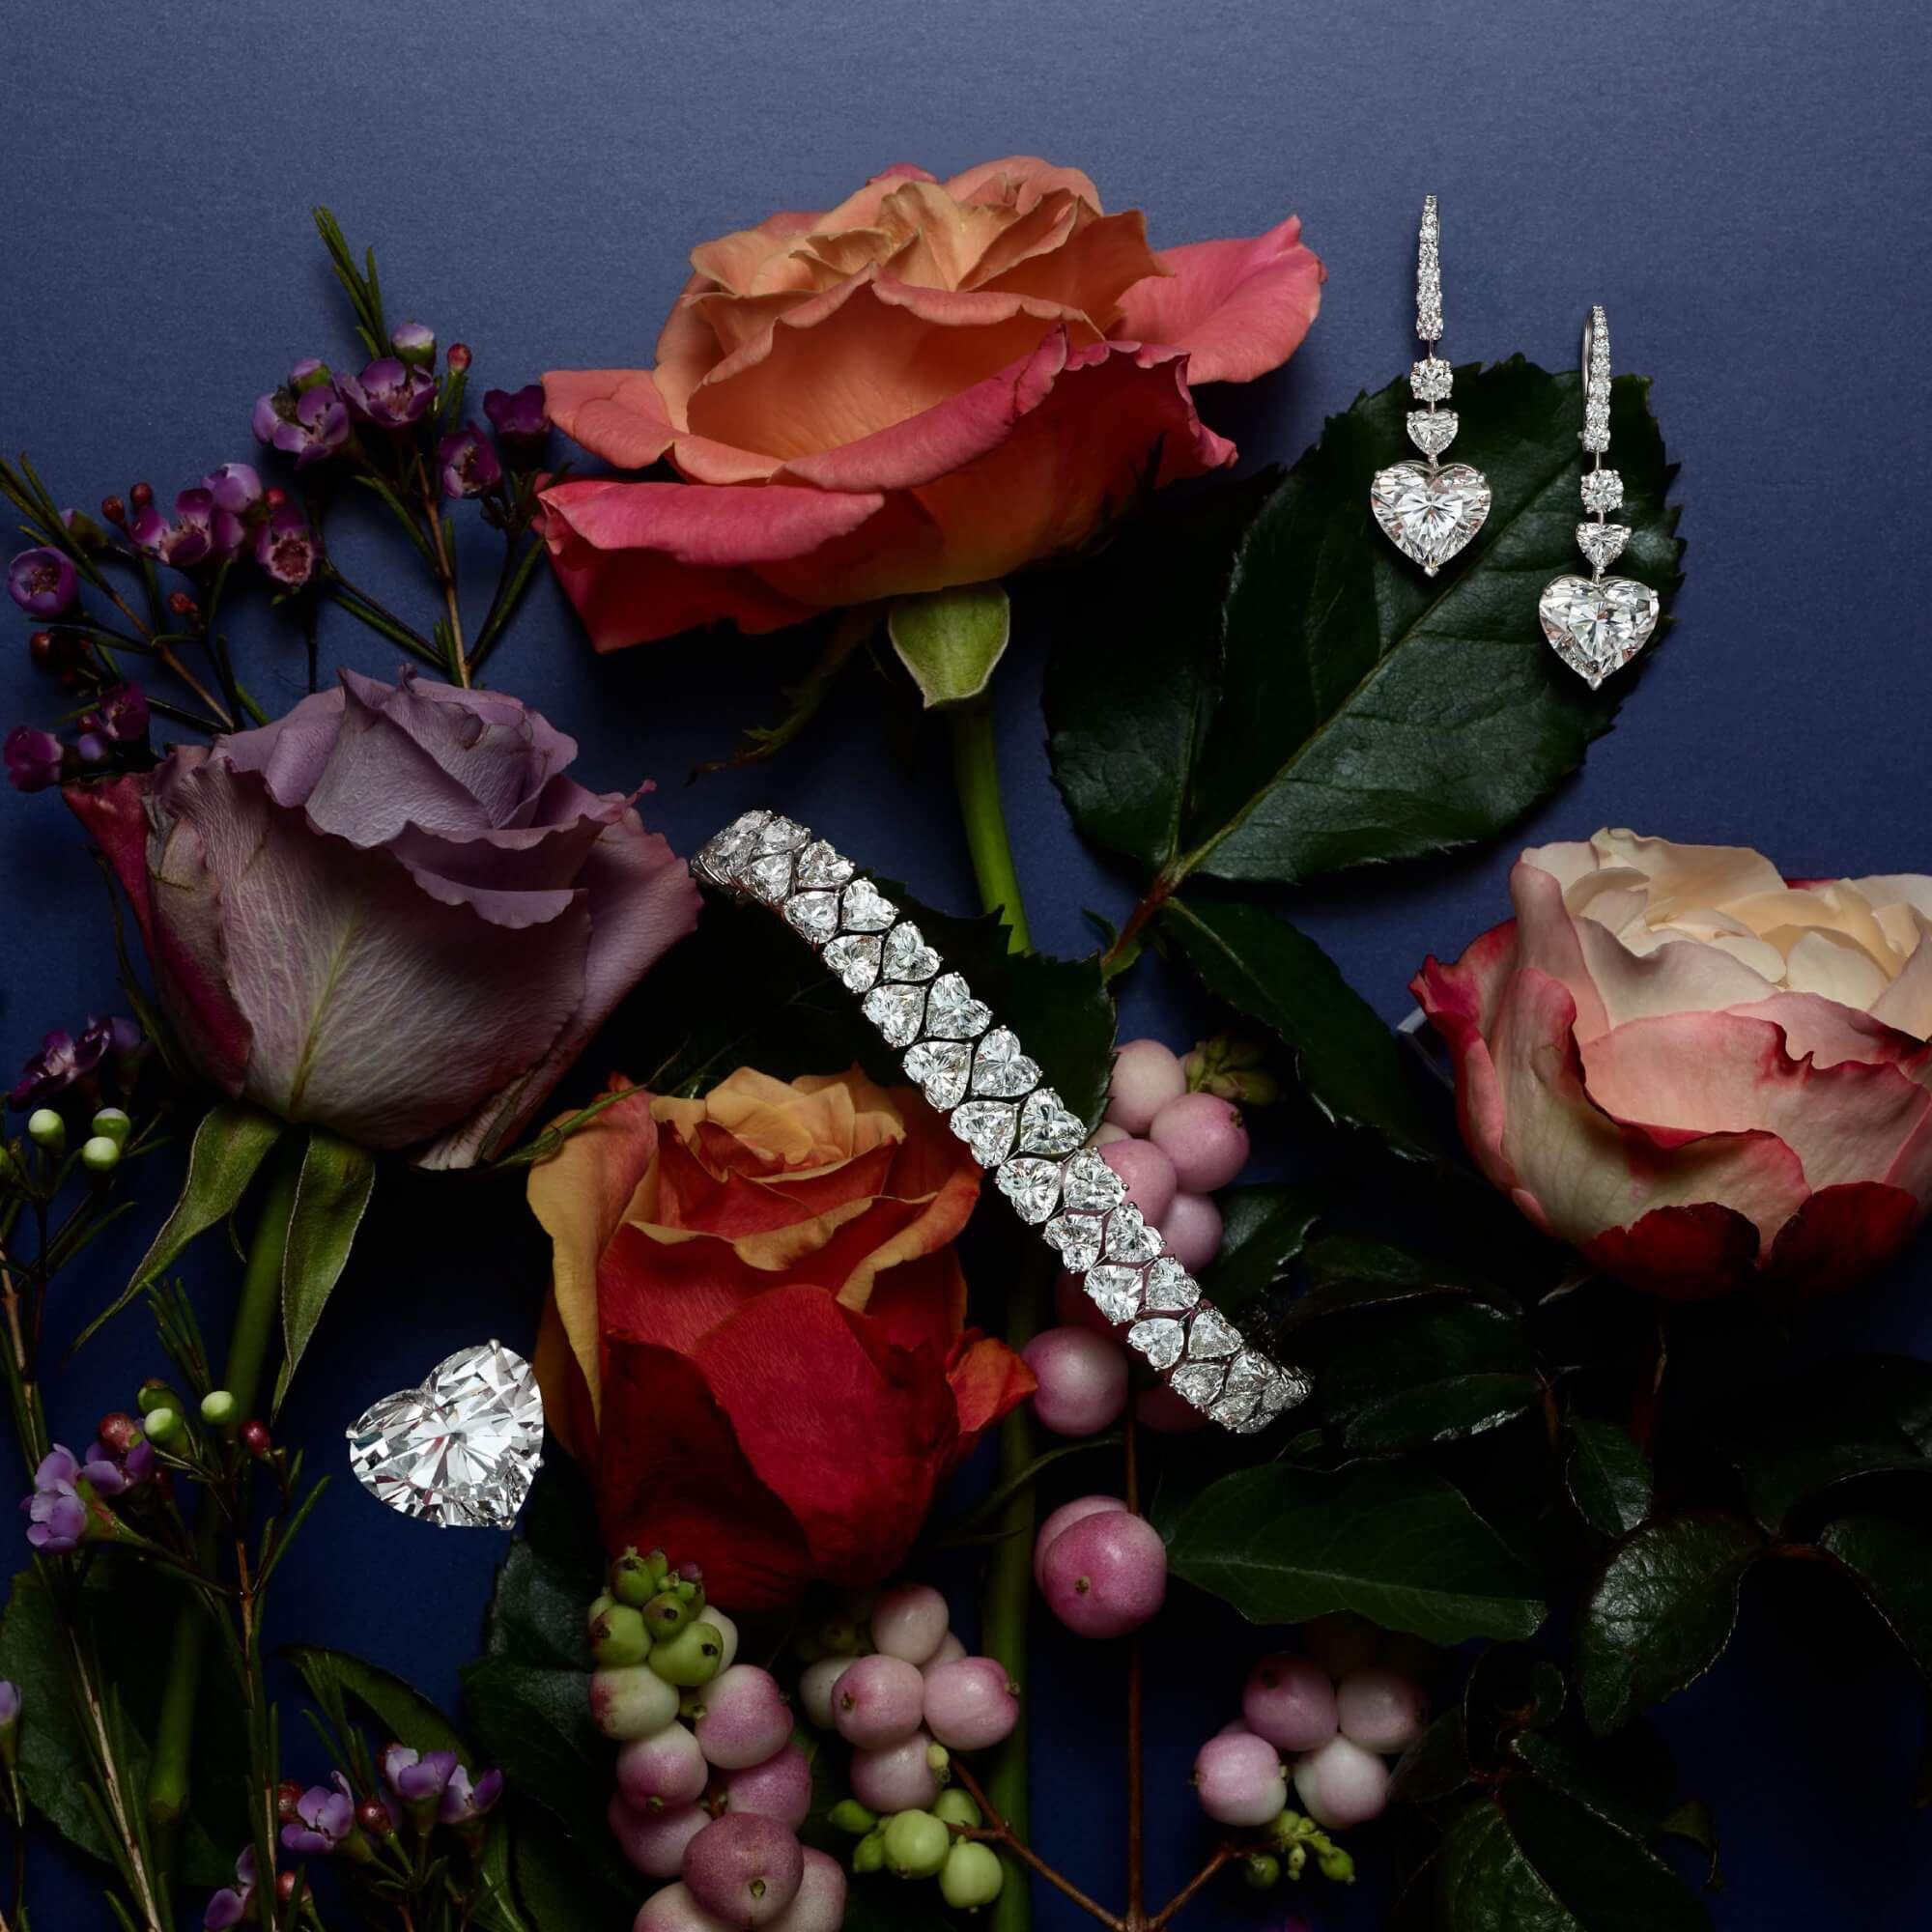 Graff diamond jewellery with flowers decorations